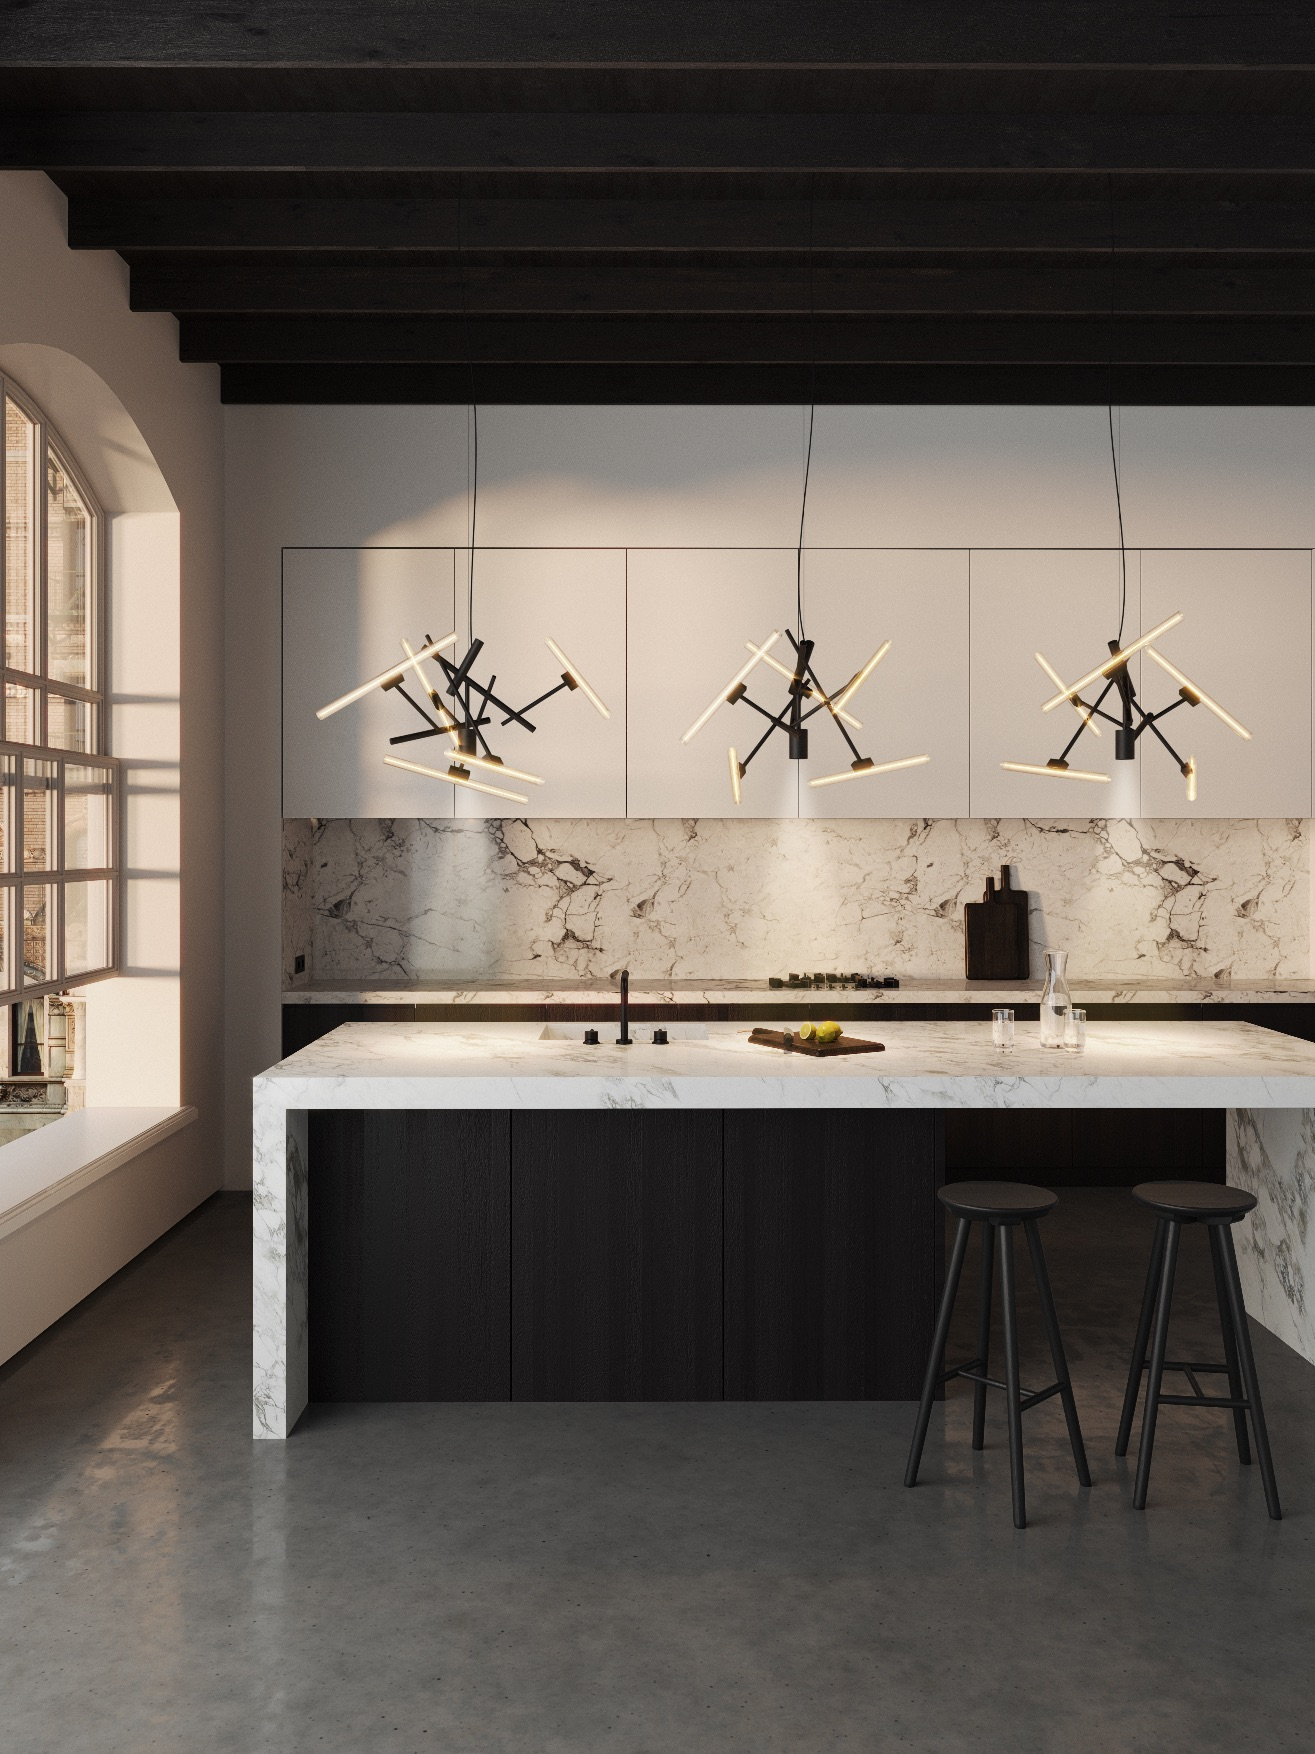 Brandvanegmond_Linea-collection_lighting-element_3x-LINLT50-70BLM_black-matt-finish_interior